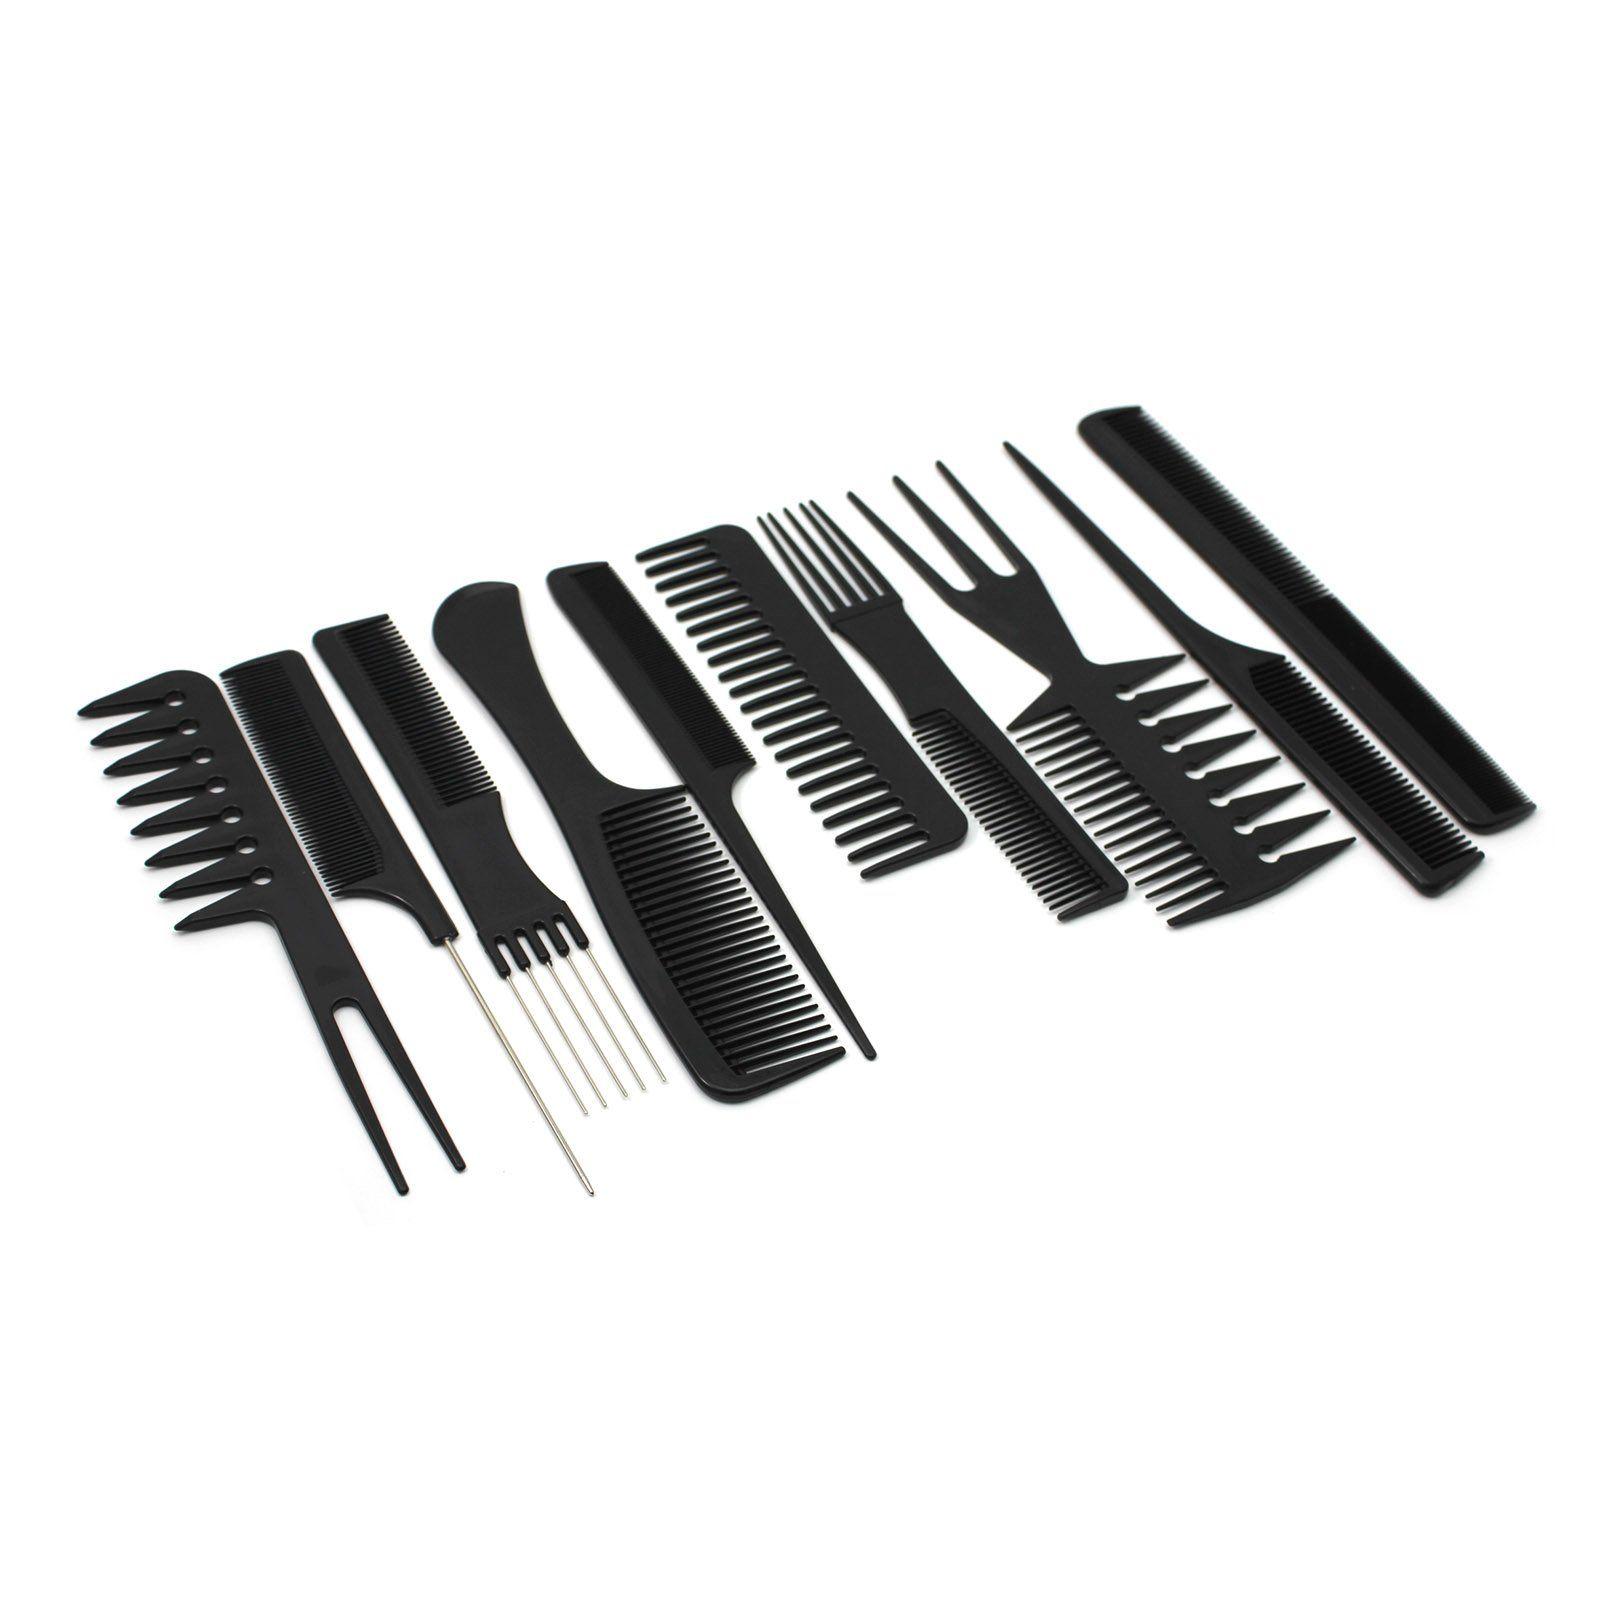 10 Pcs Set Professional Salon Hairdressing Tools Home Hair Styling Combs Styling Comb Hairdresser Hair Styles